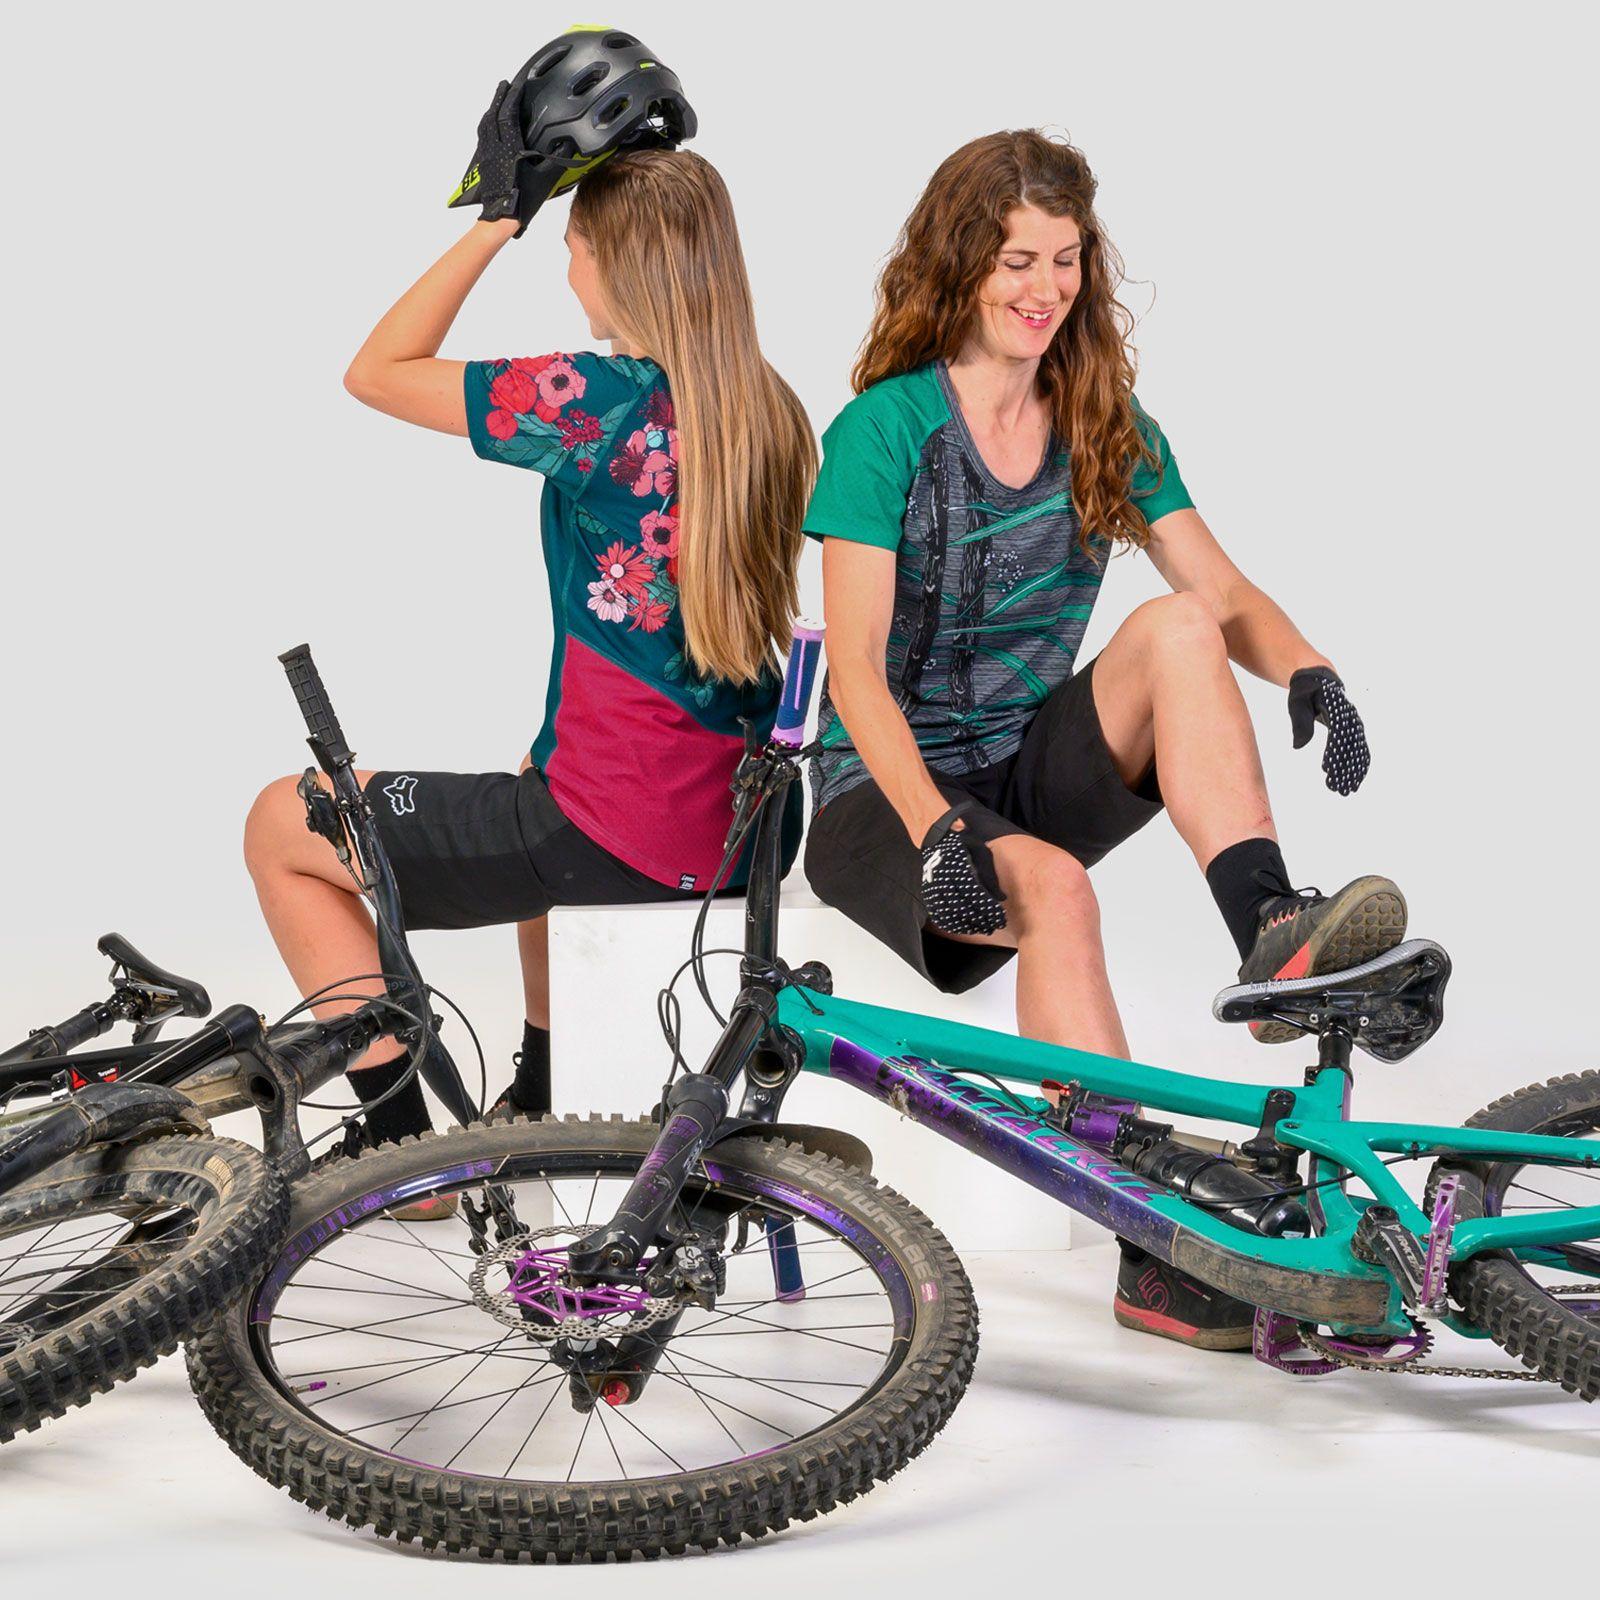 Loose Line New Zealand Hand Drawn Bike Jersey Tramping Shirt Enduro Riding In 2020 Bike Jersey Outdoor Shirt Riding